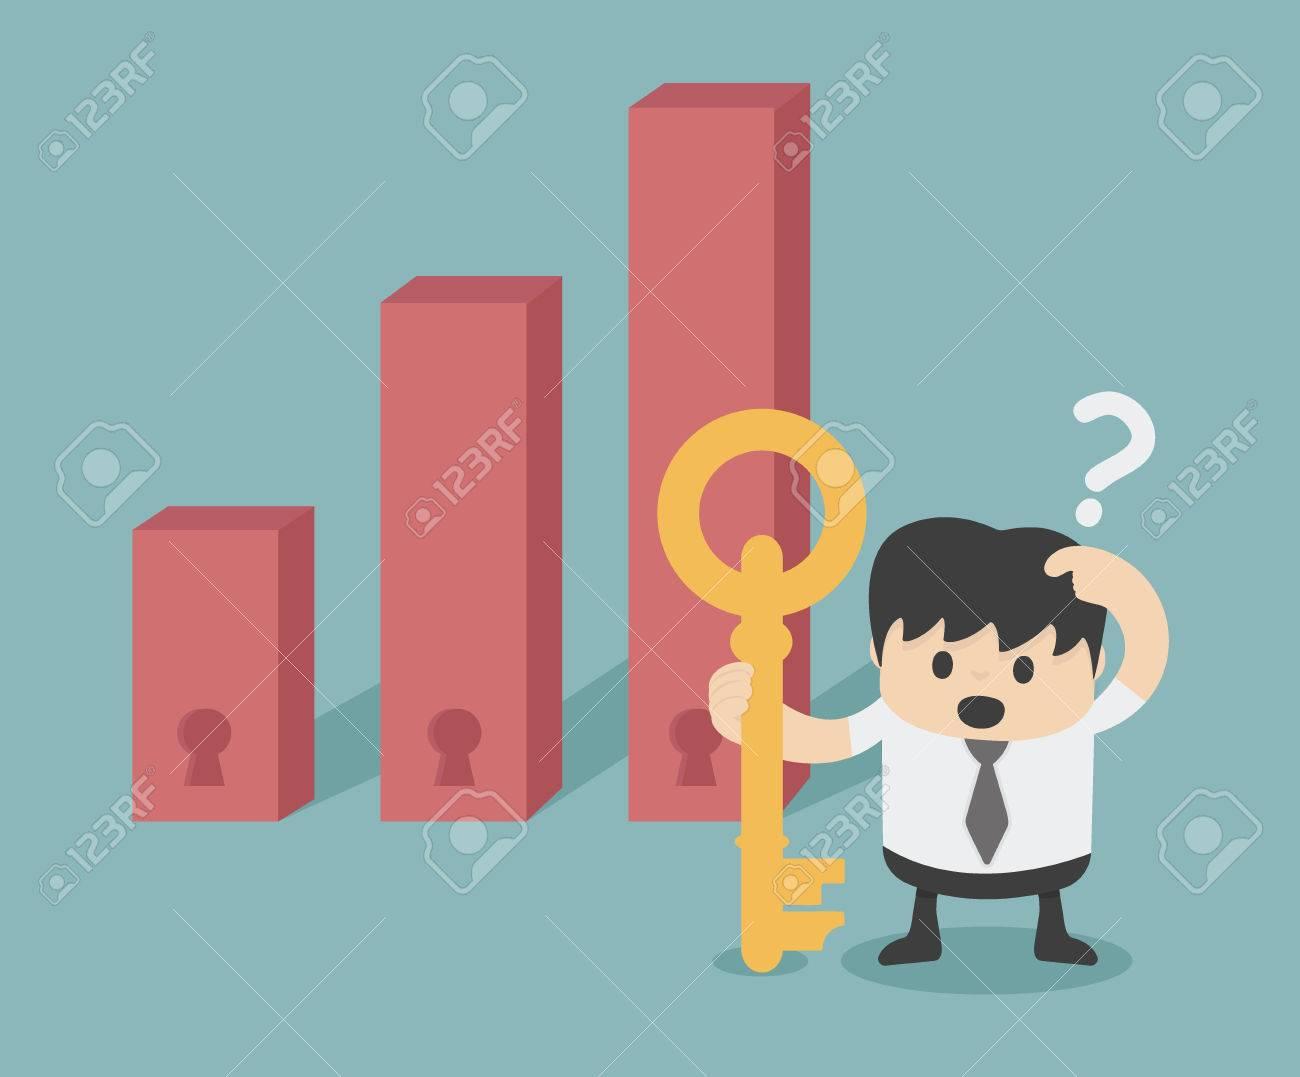 decision making invest Banque d'images - 35004049